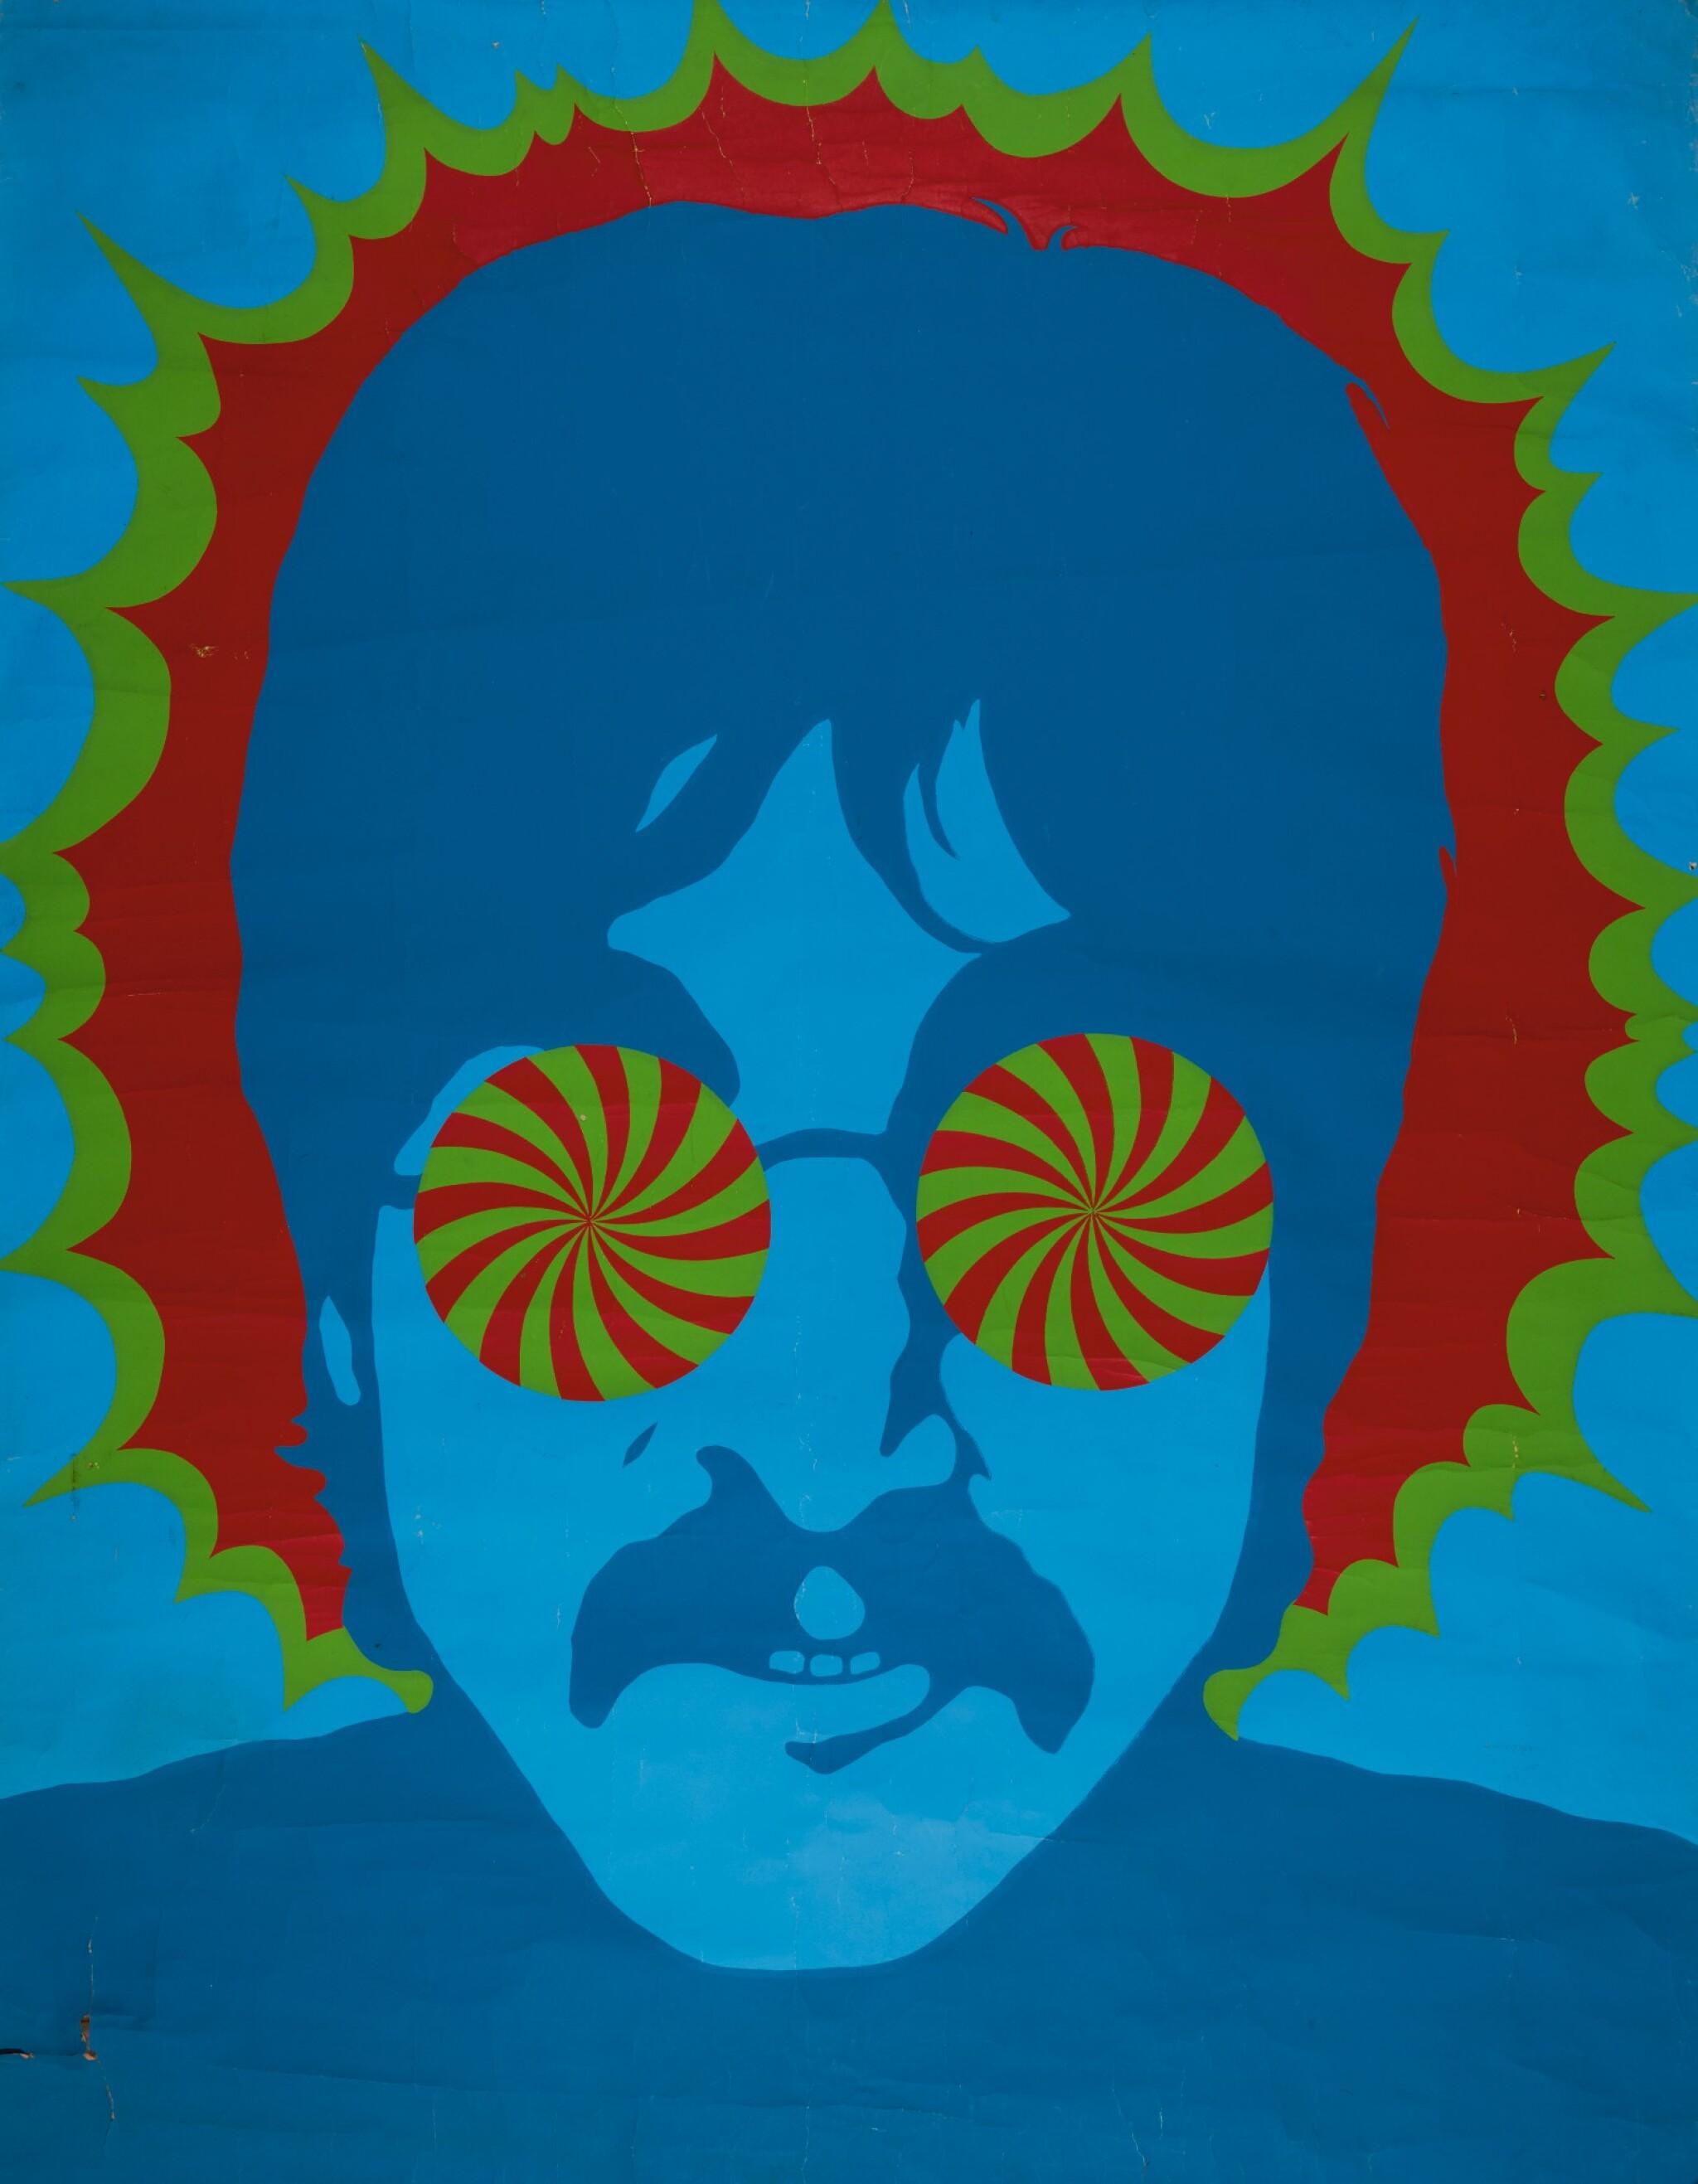 LARRY SMART   Kaleidoscope Eyes, John Lennon, original poster from the Apple Boutique